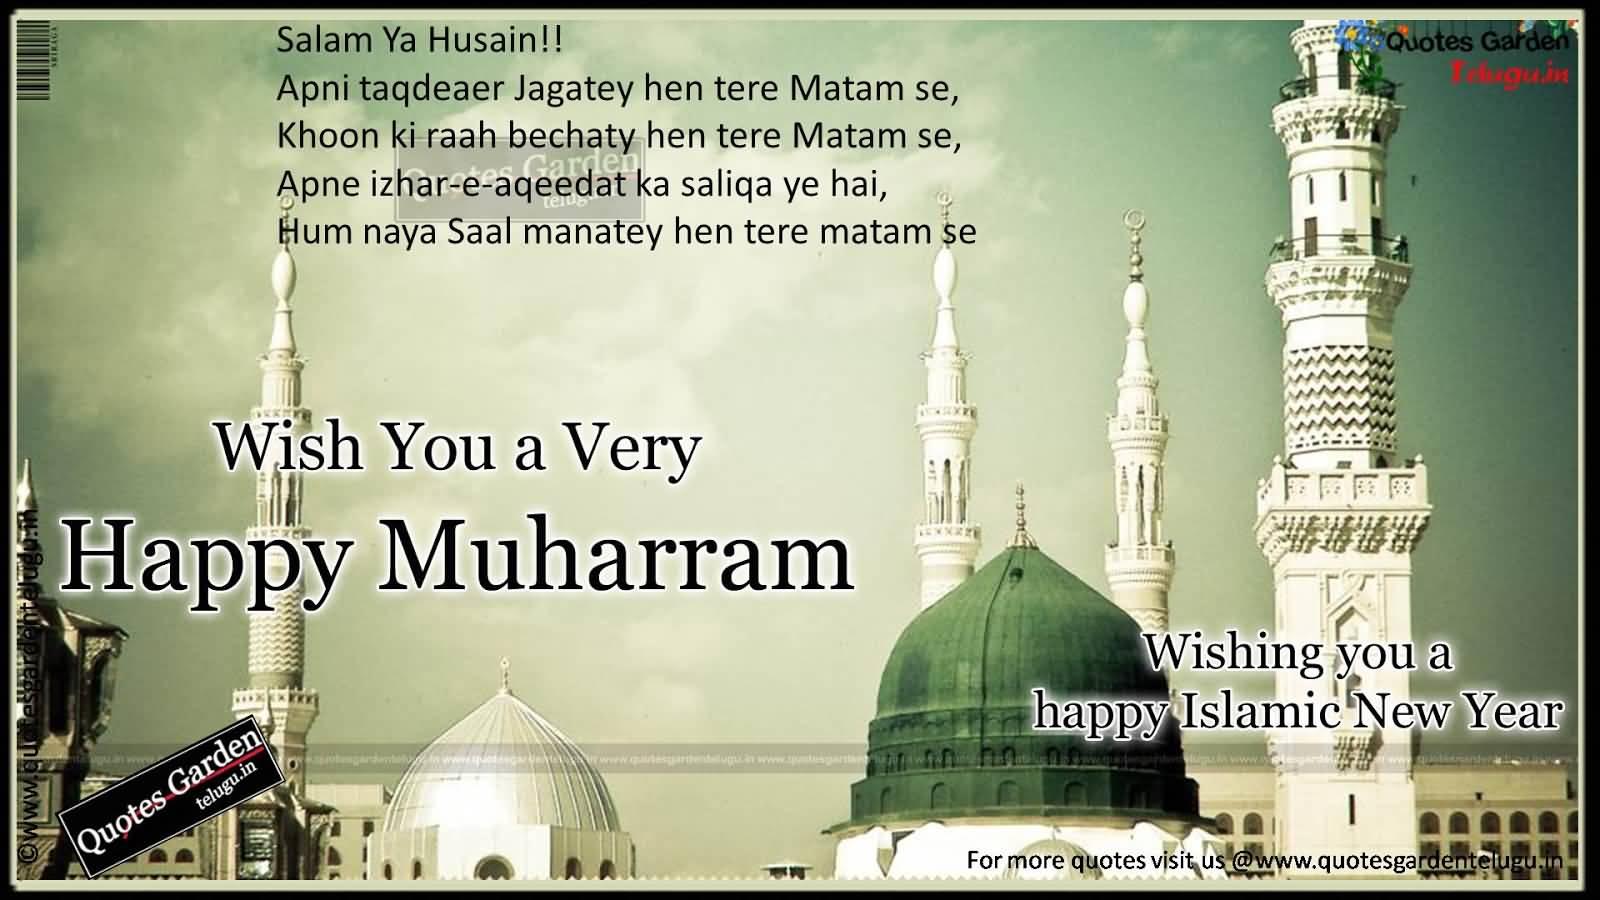 Wish You A Very Happy Muharram